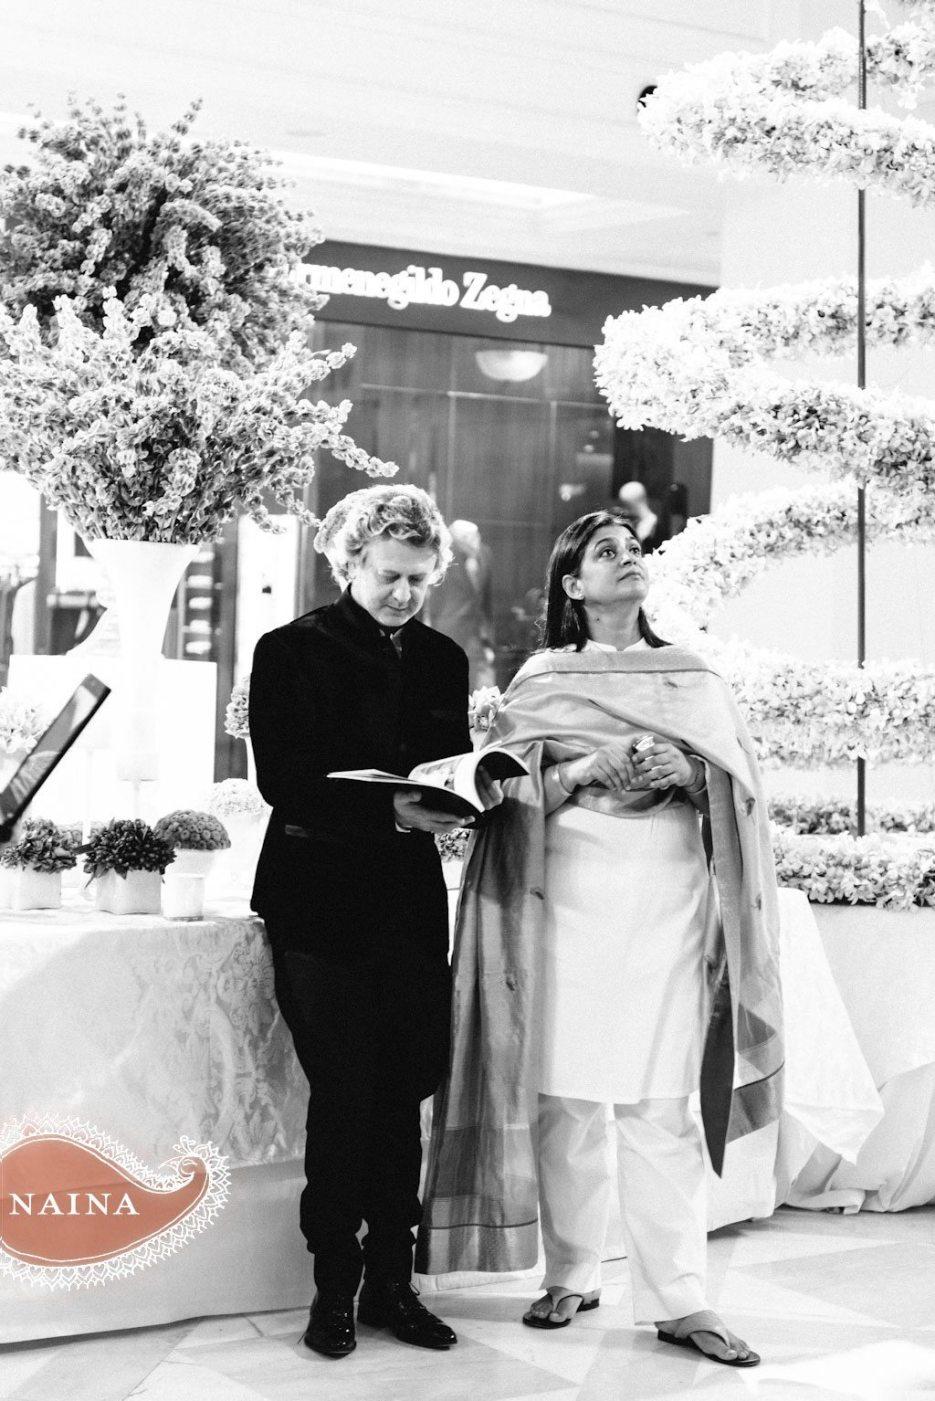 Naina-Knottytales-Professional-Photographer-Wedding-Atelier-2012-53.jpg